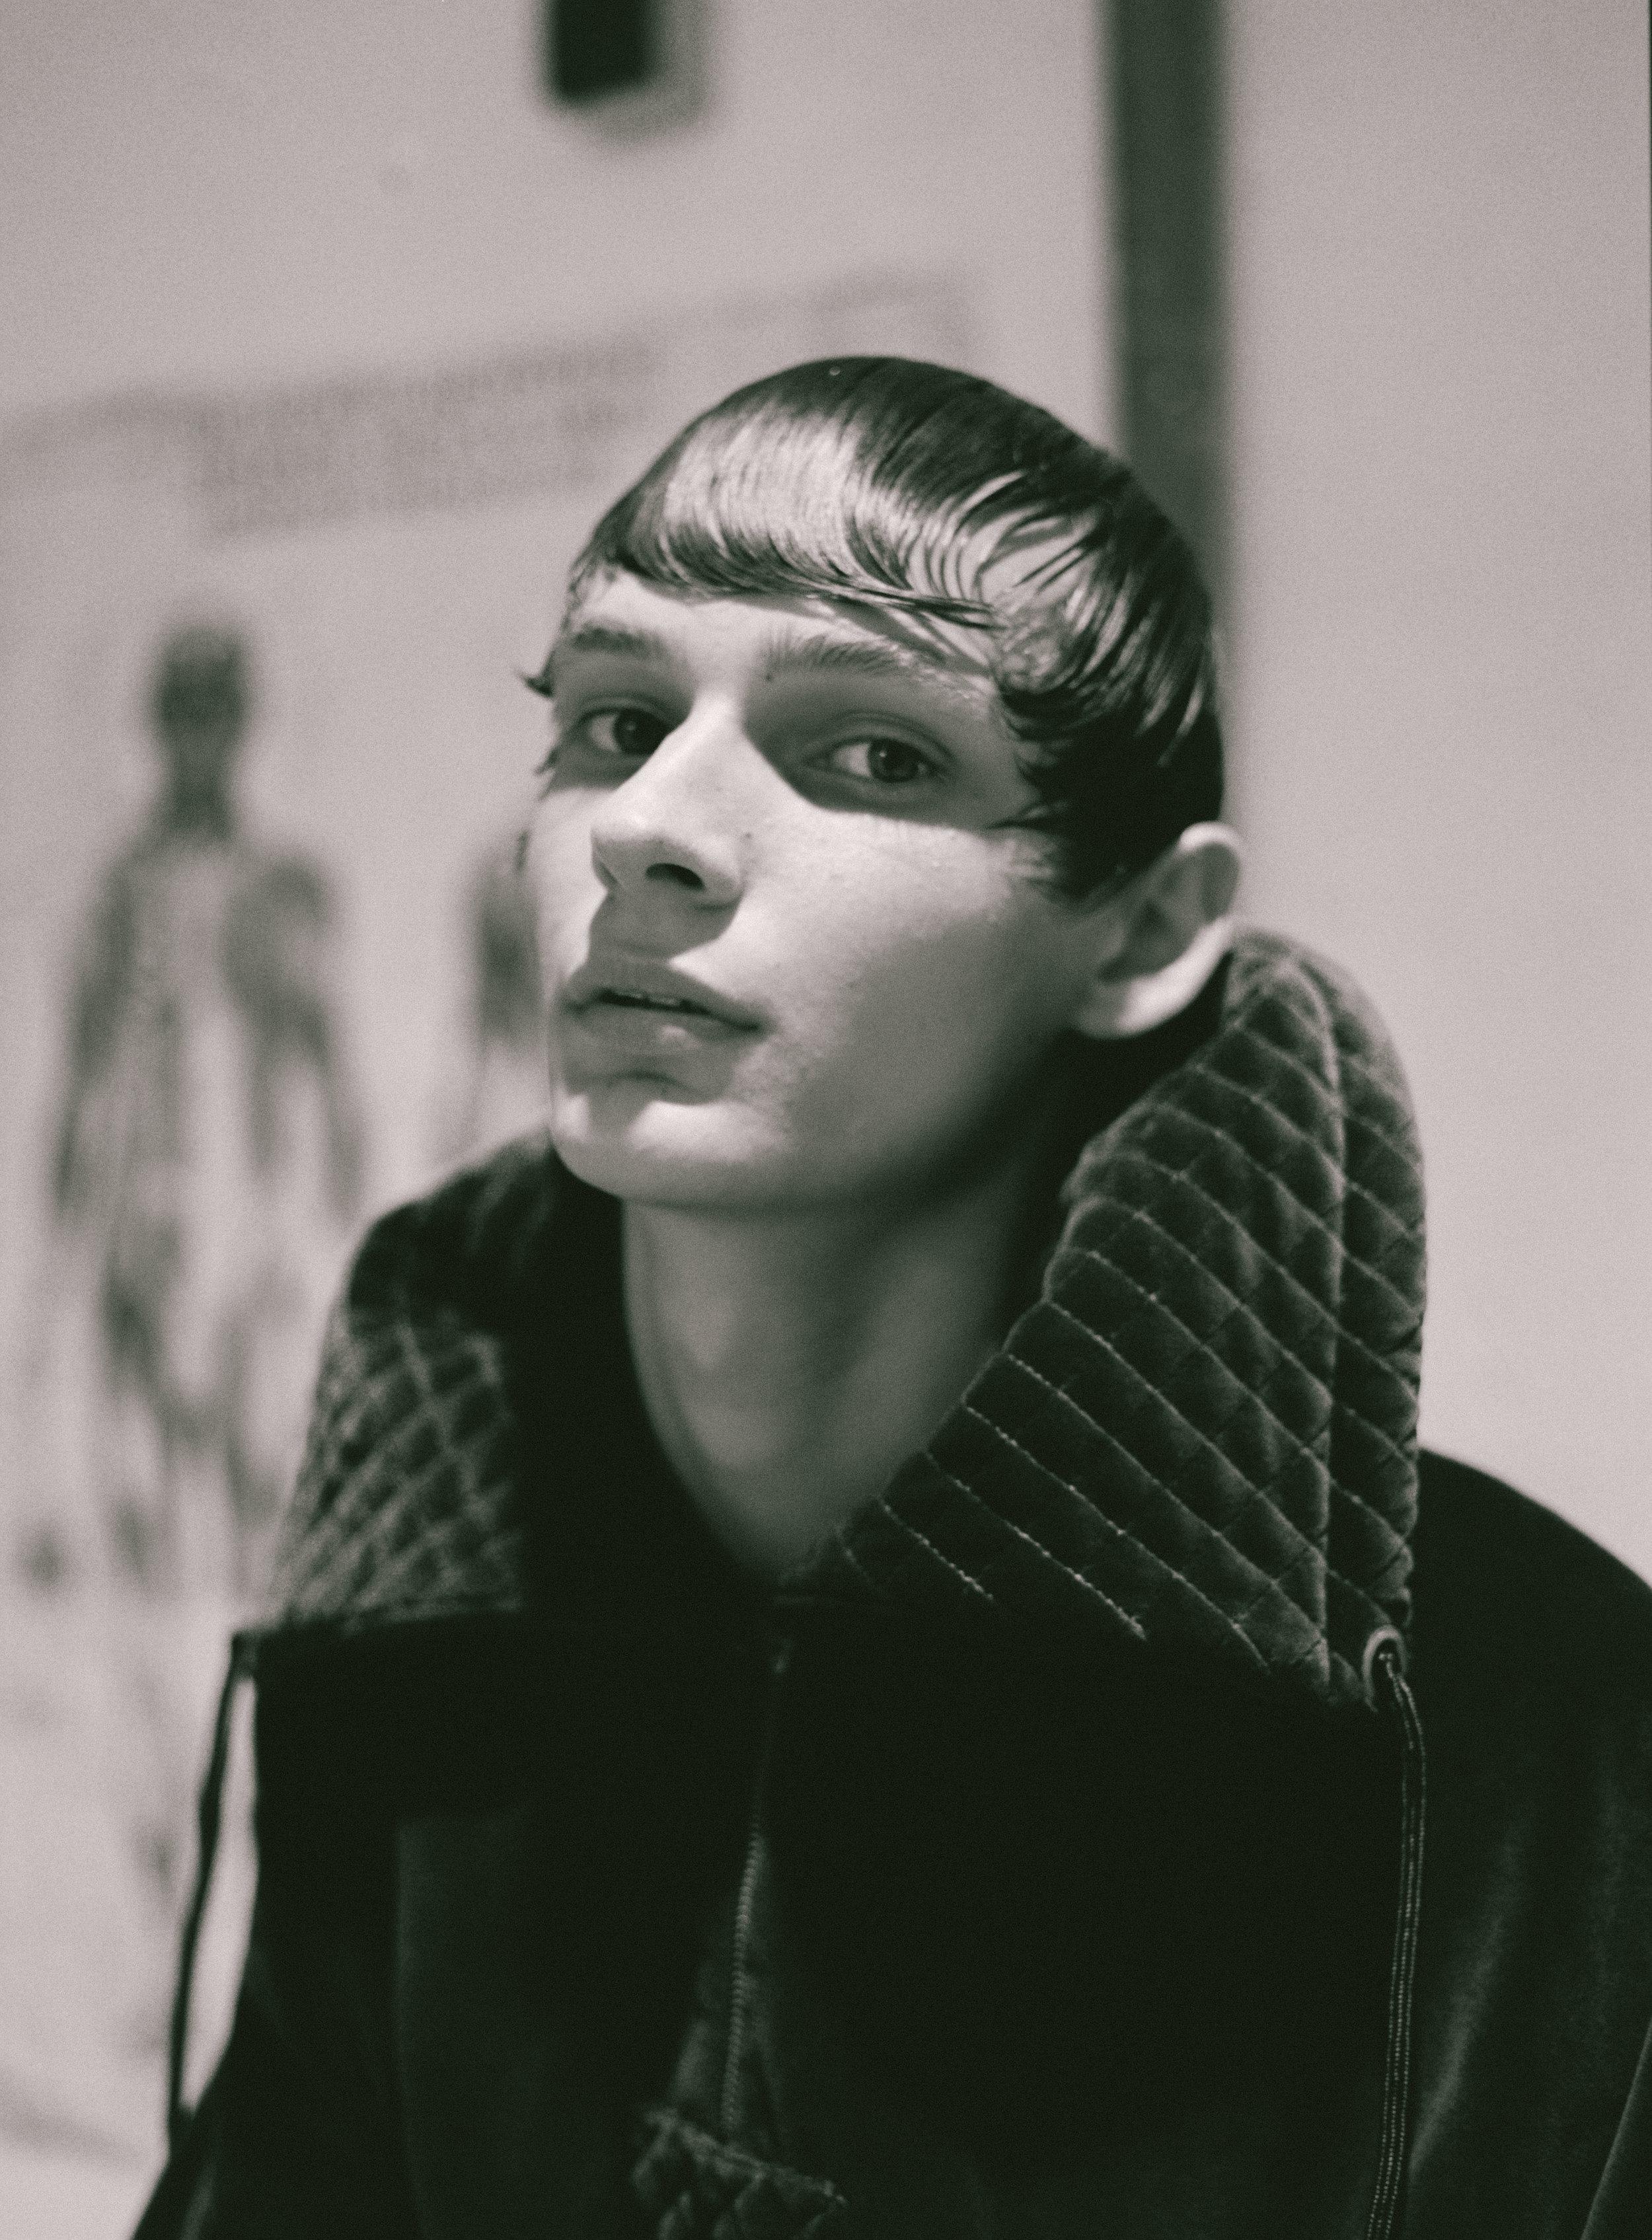 https://www.vogue.cz/clanek/fashion/fotografie/tym-vogue/showtime